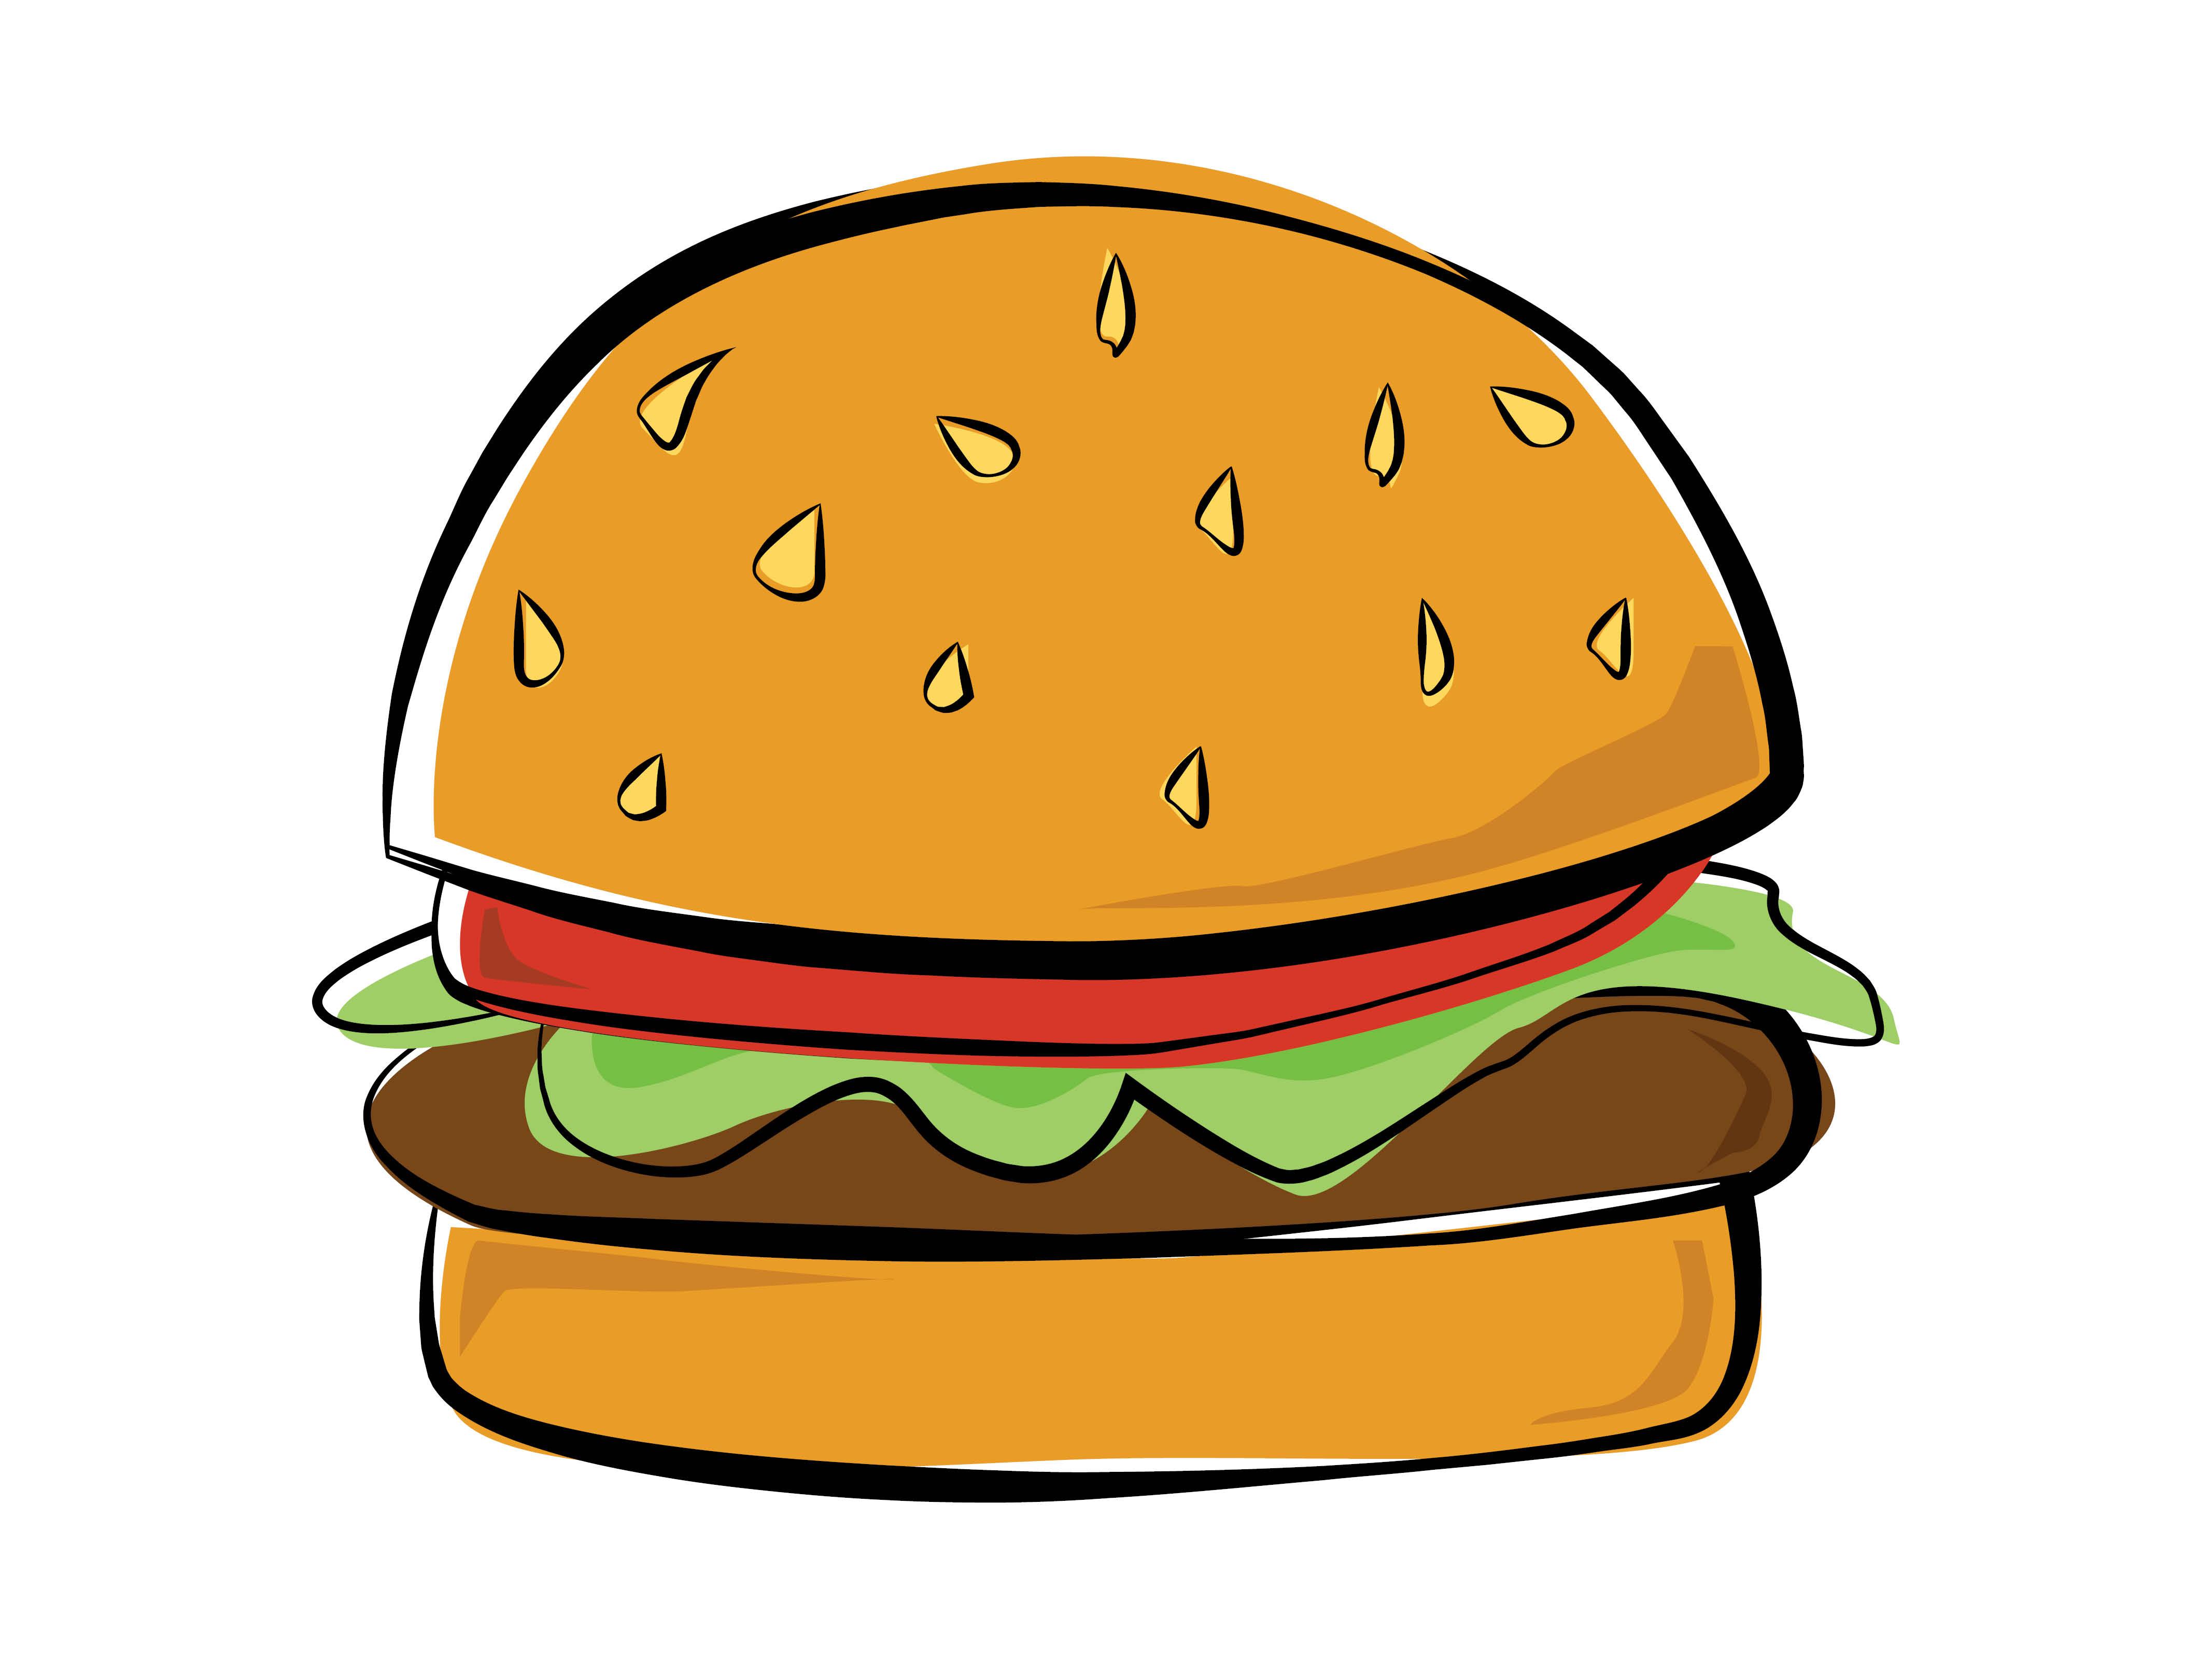 burger drawing at getdrawings com free for personal use burger